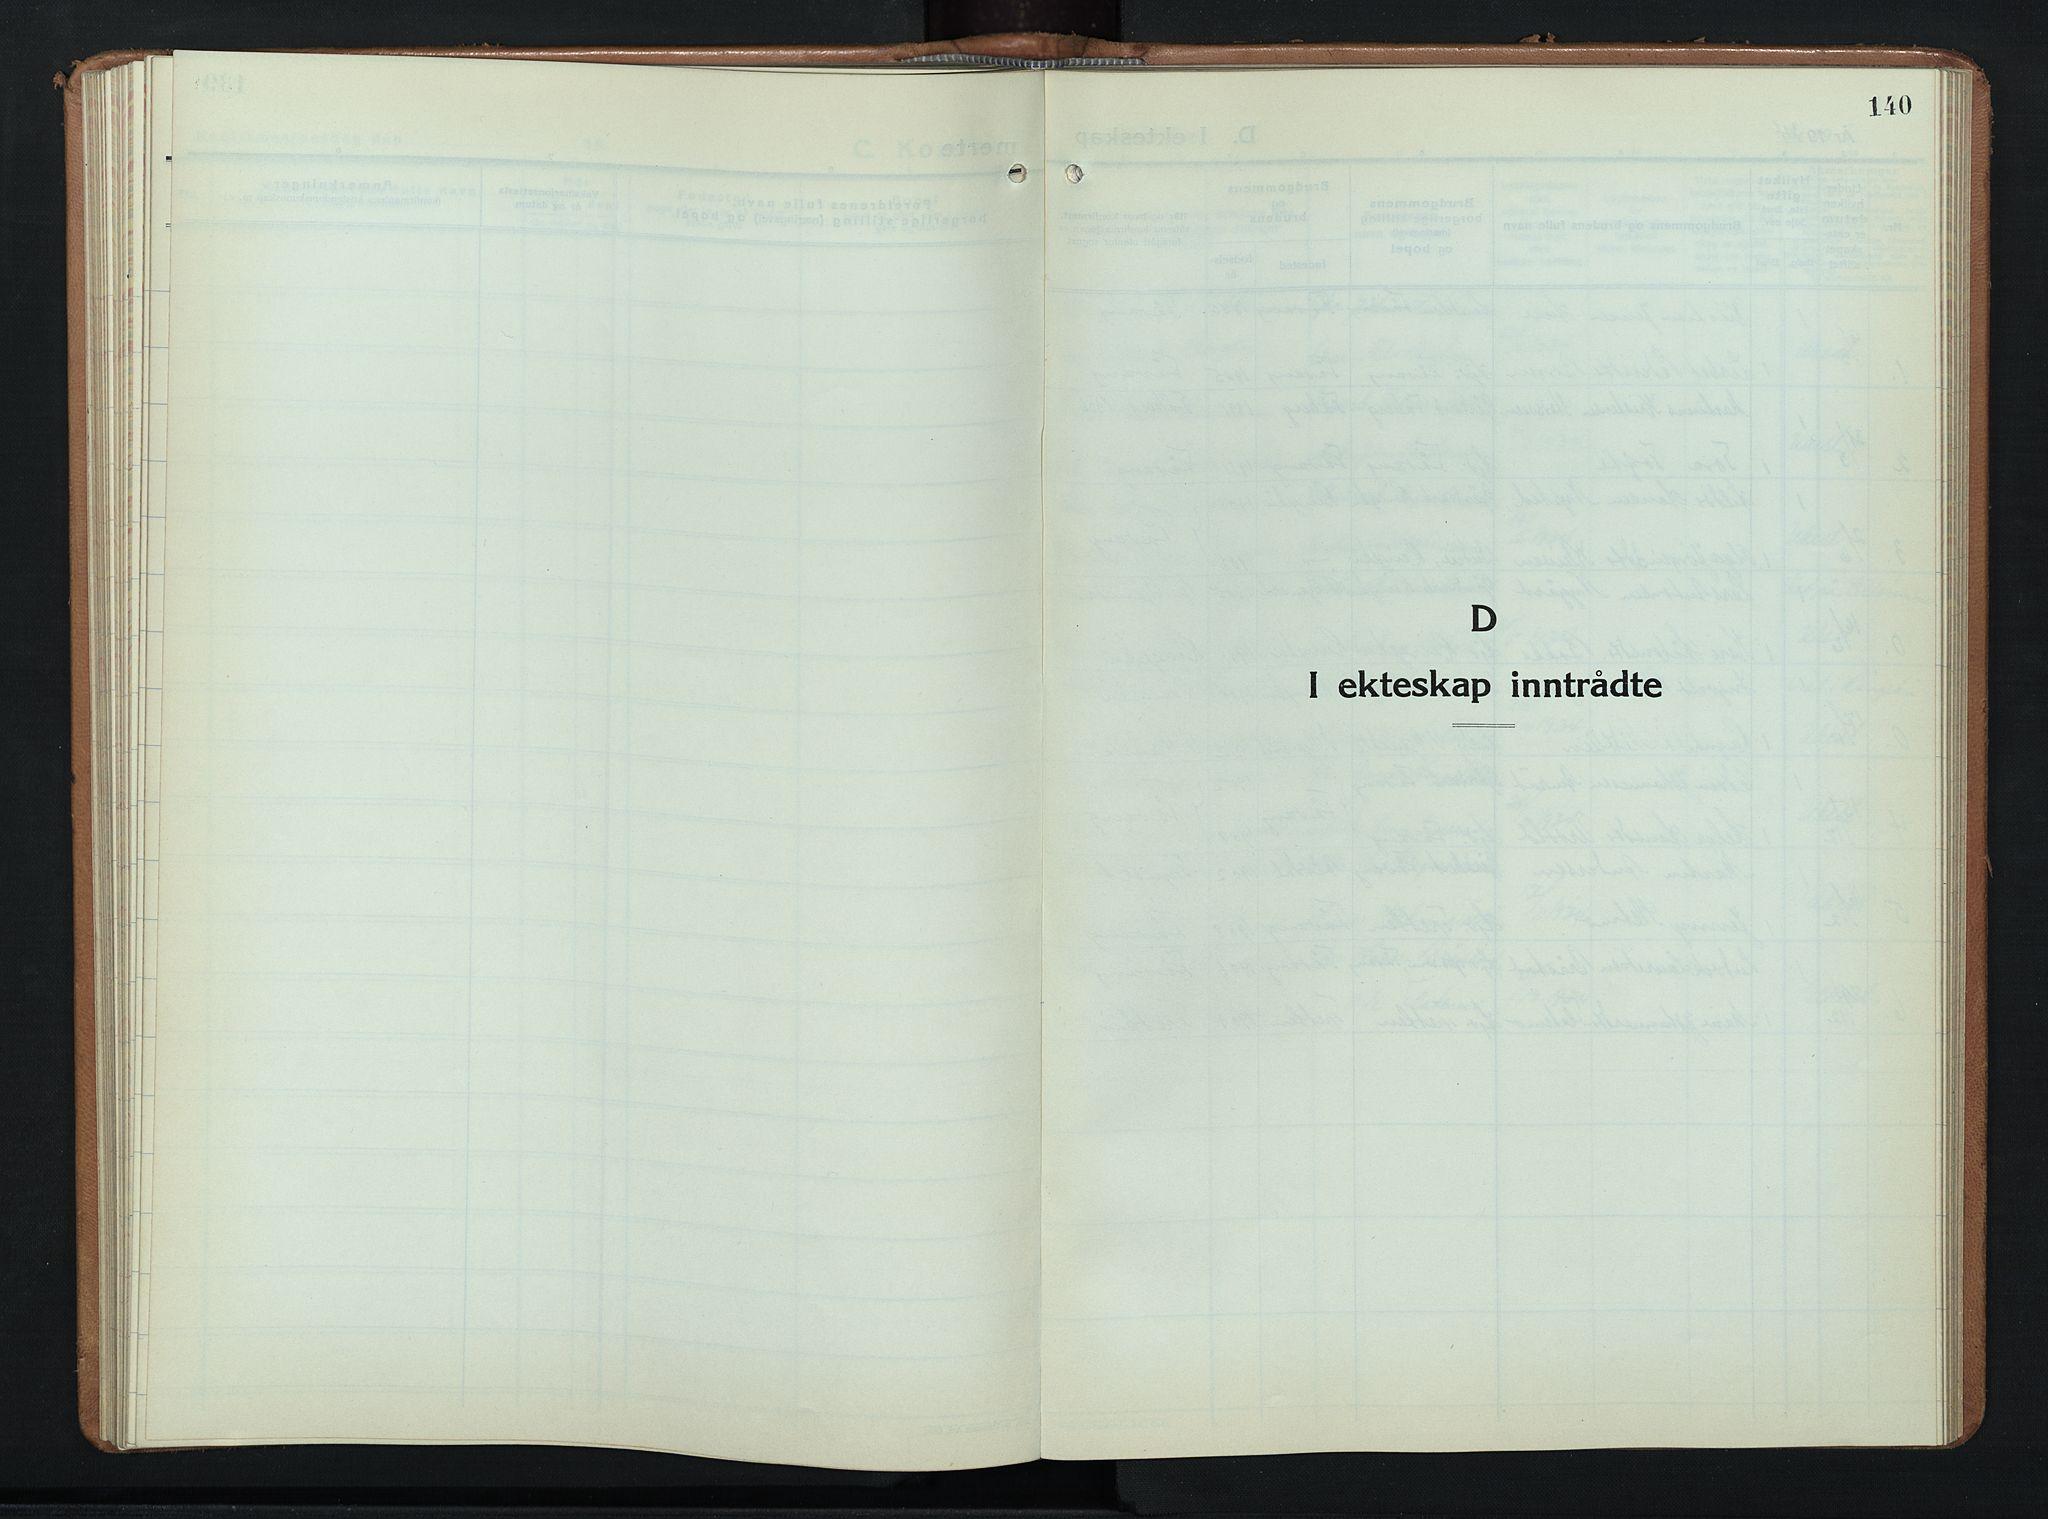 SAH, Ringebu prestekontor, Klokkerbok nr. 12, 1934-1949, s. 140